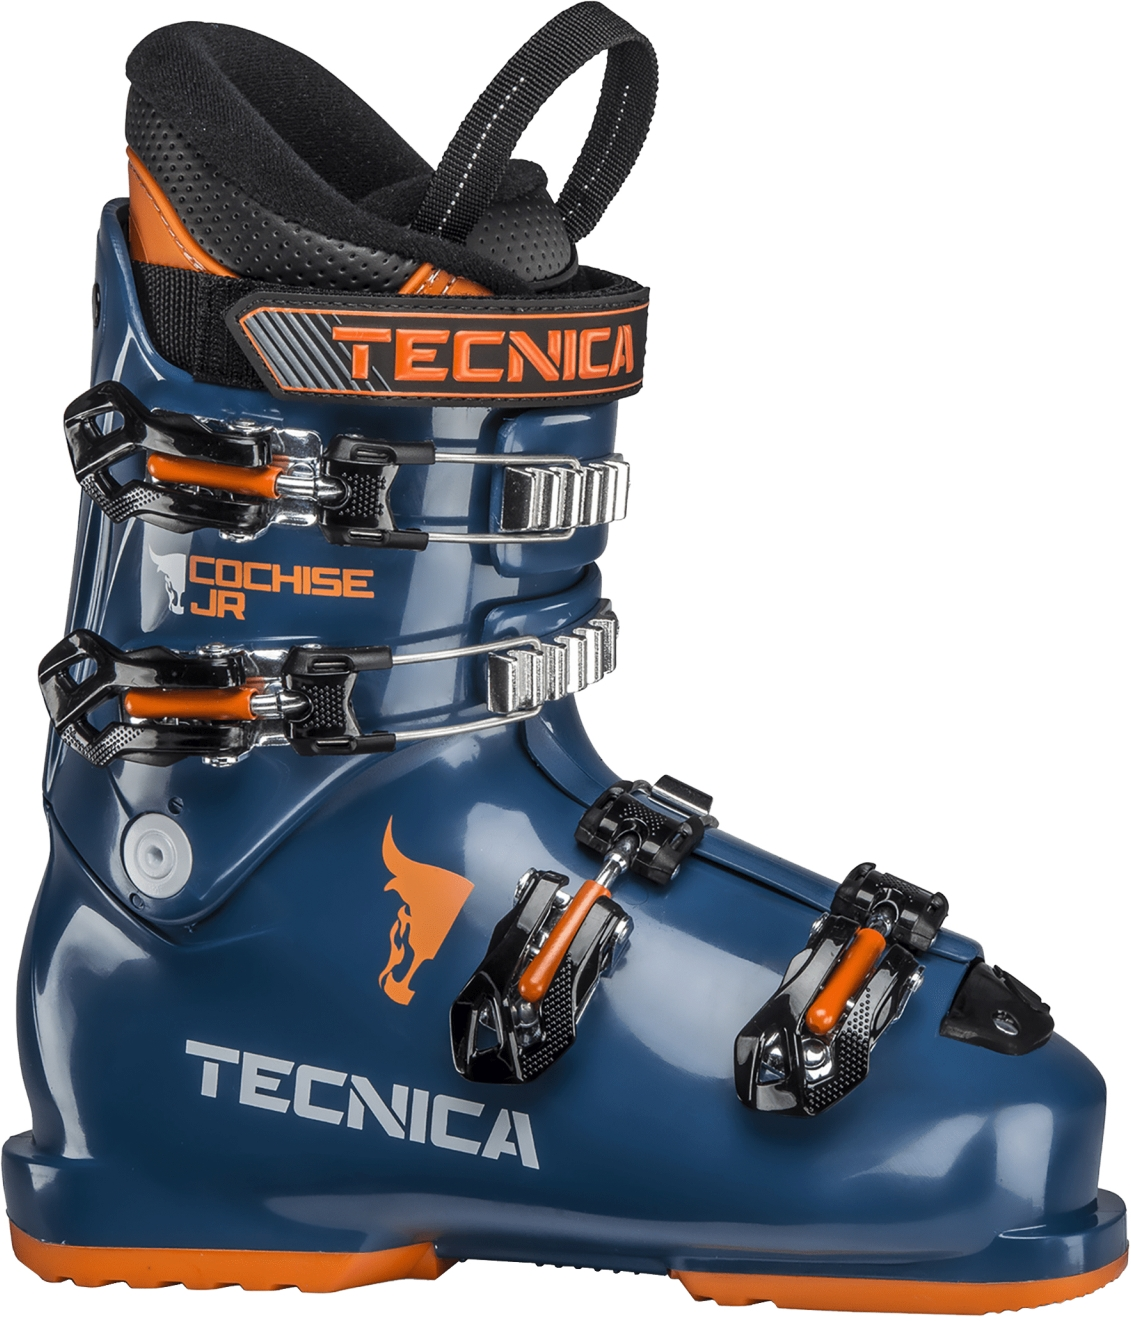 Tecnica Cochise JR - dark process blue 210